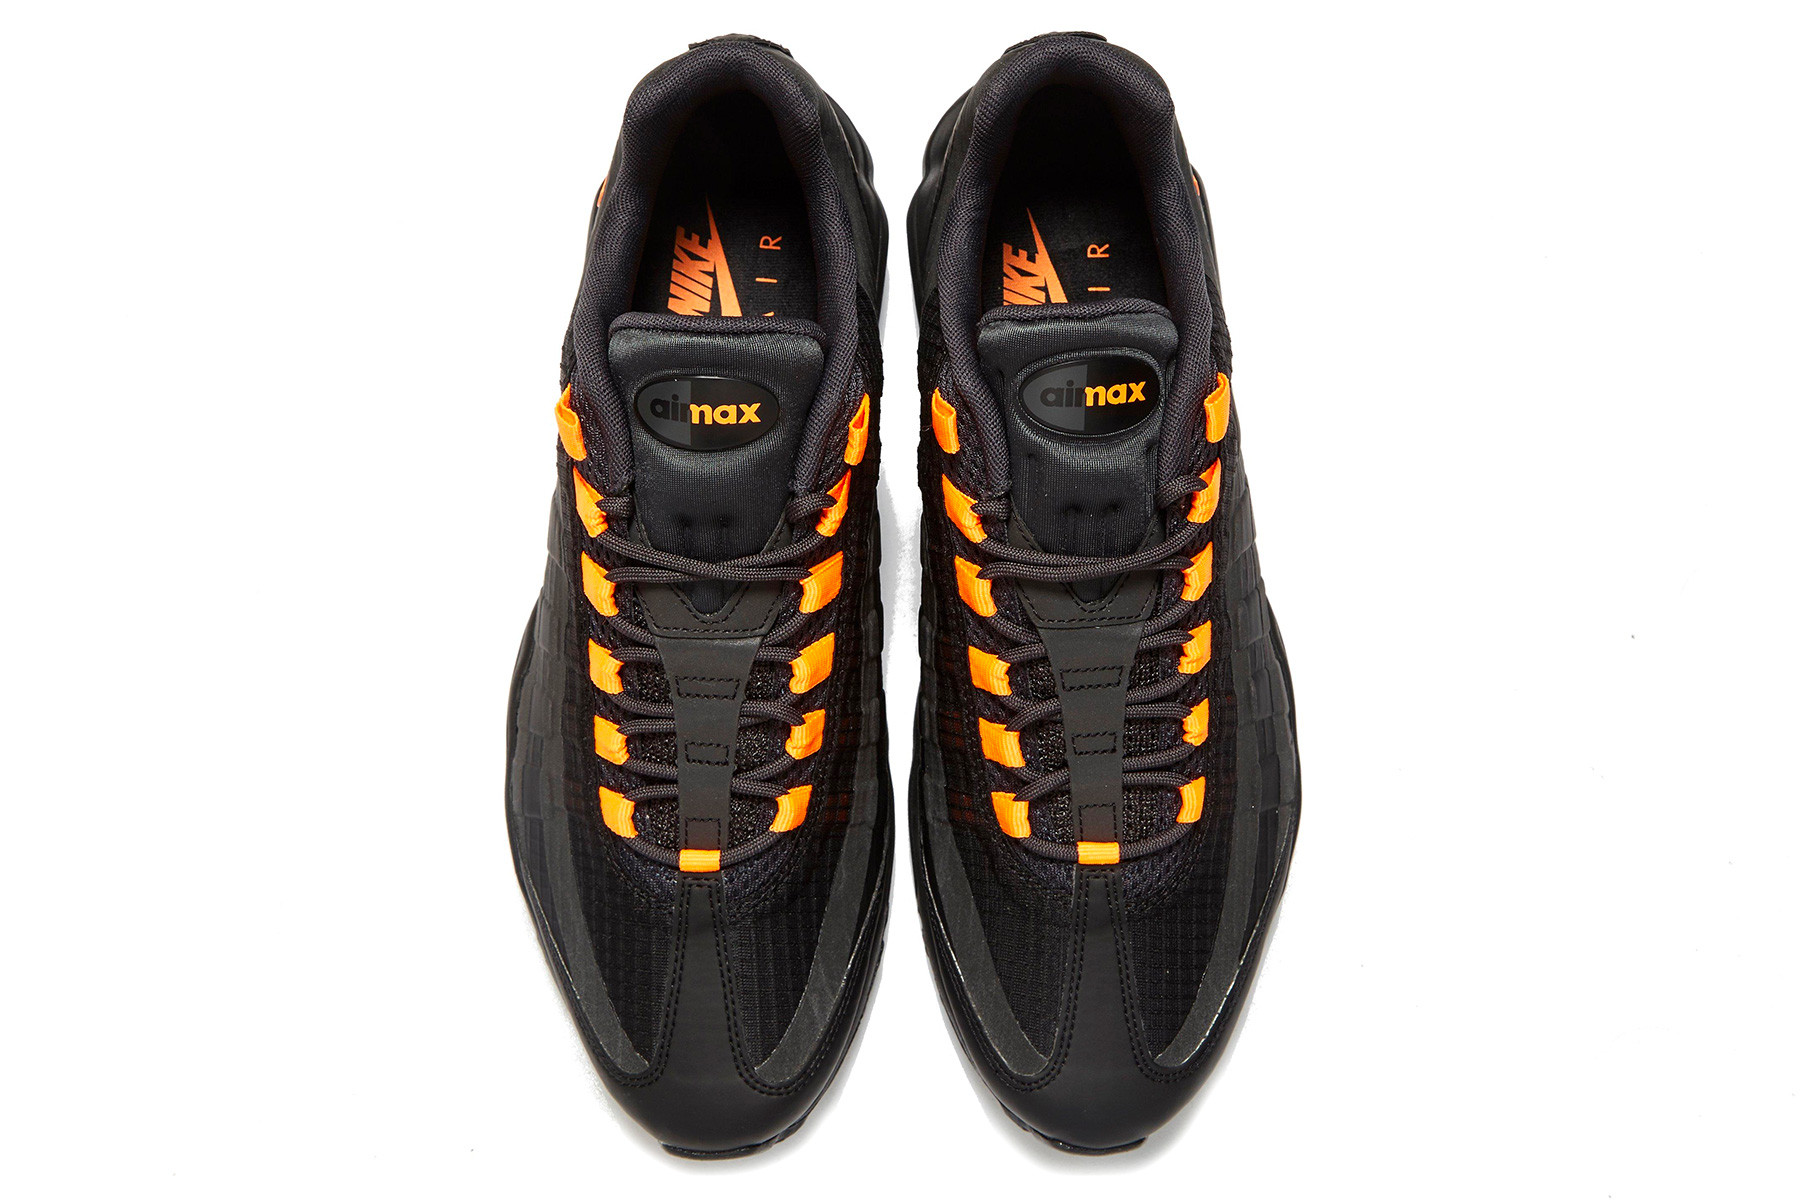 black and orange 95s